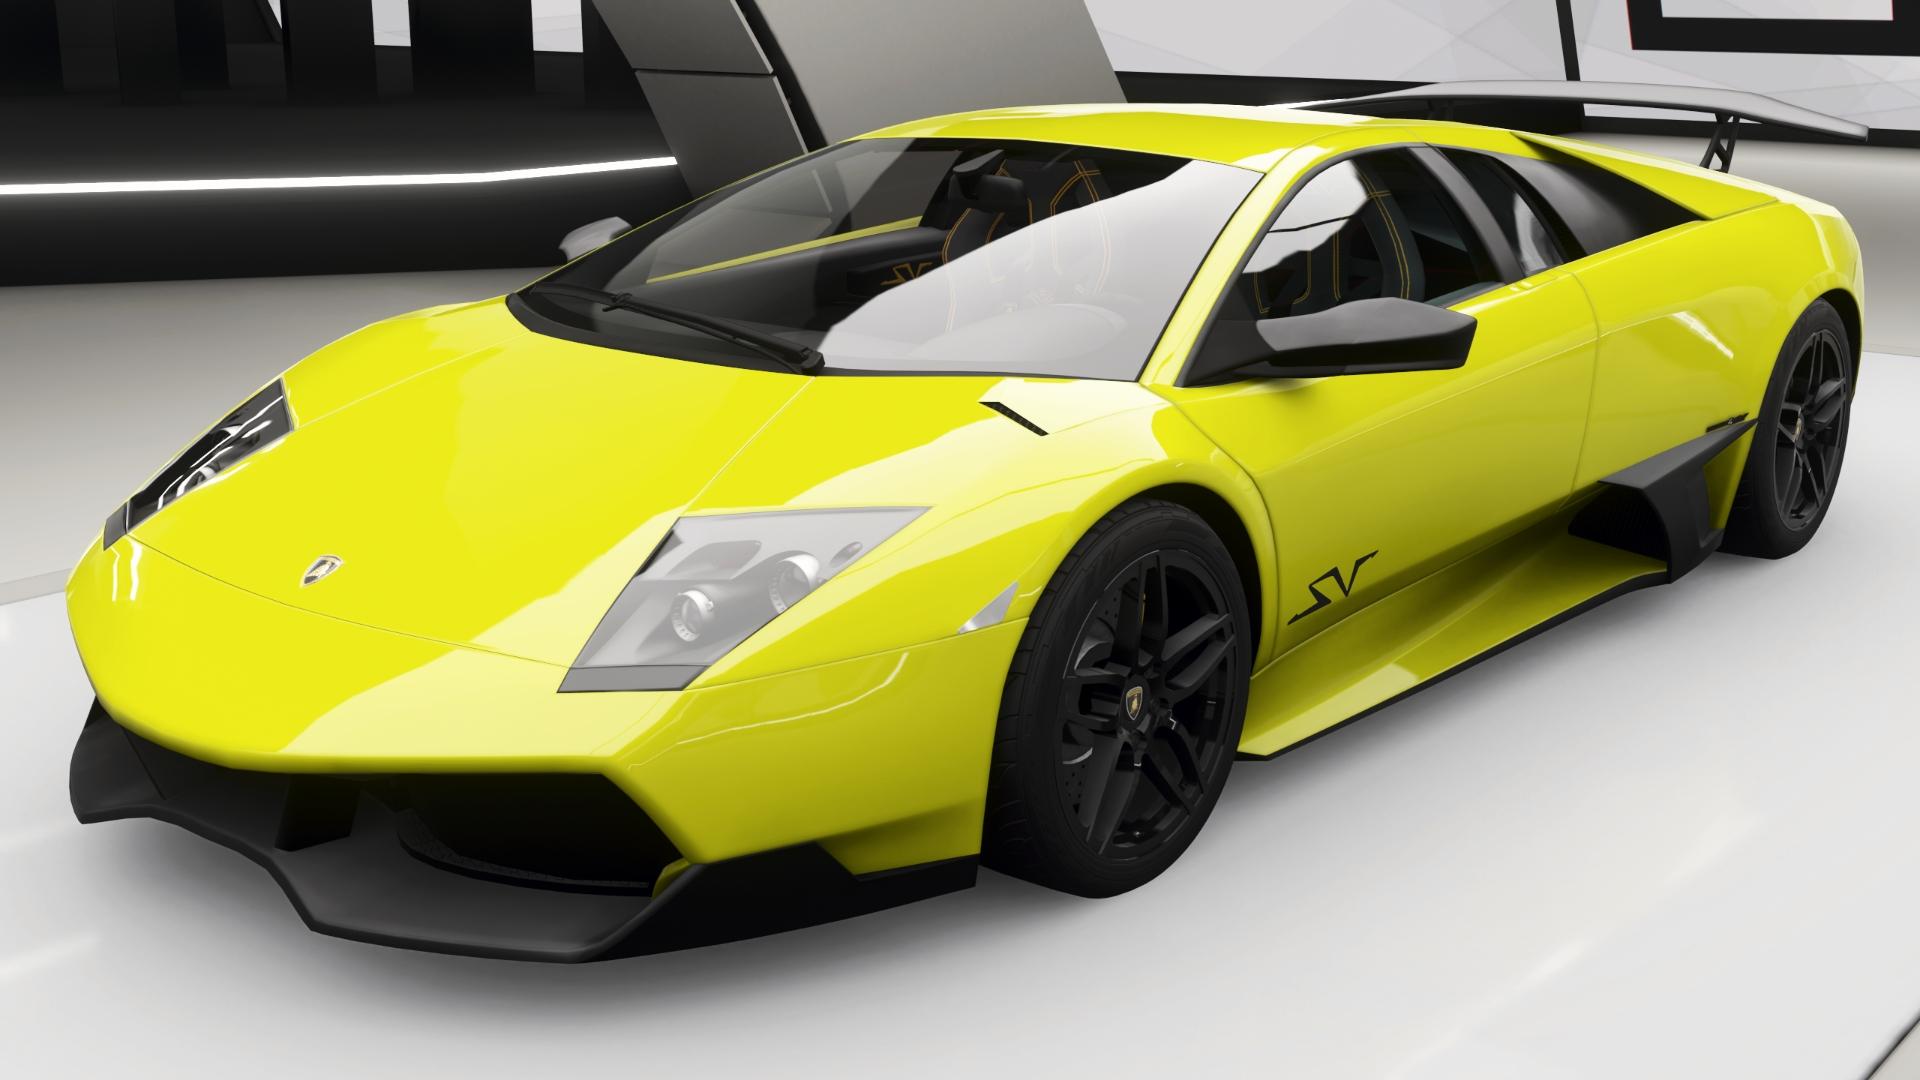 Lamborghini Murcielago Lp 670 4 Sv Forza Motorsport Wiki Fandom